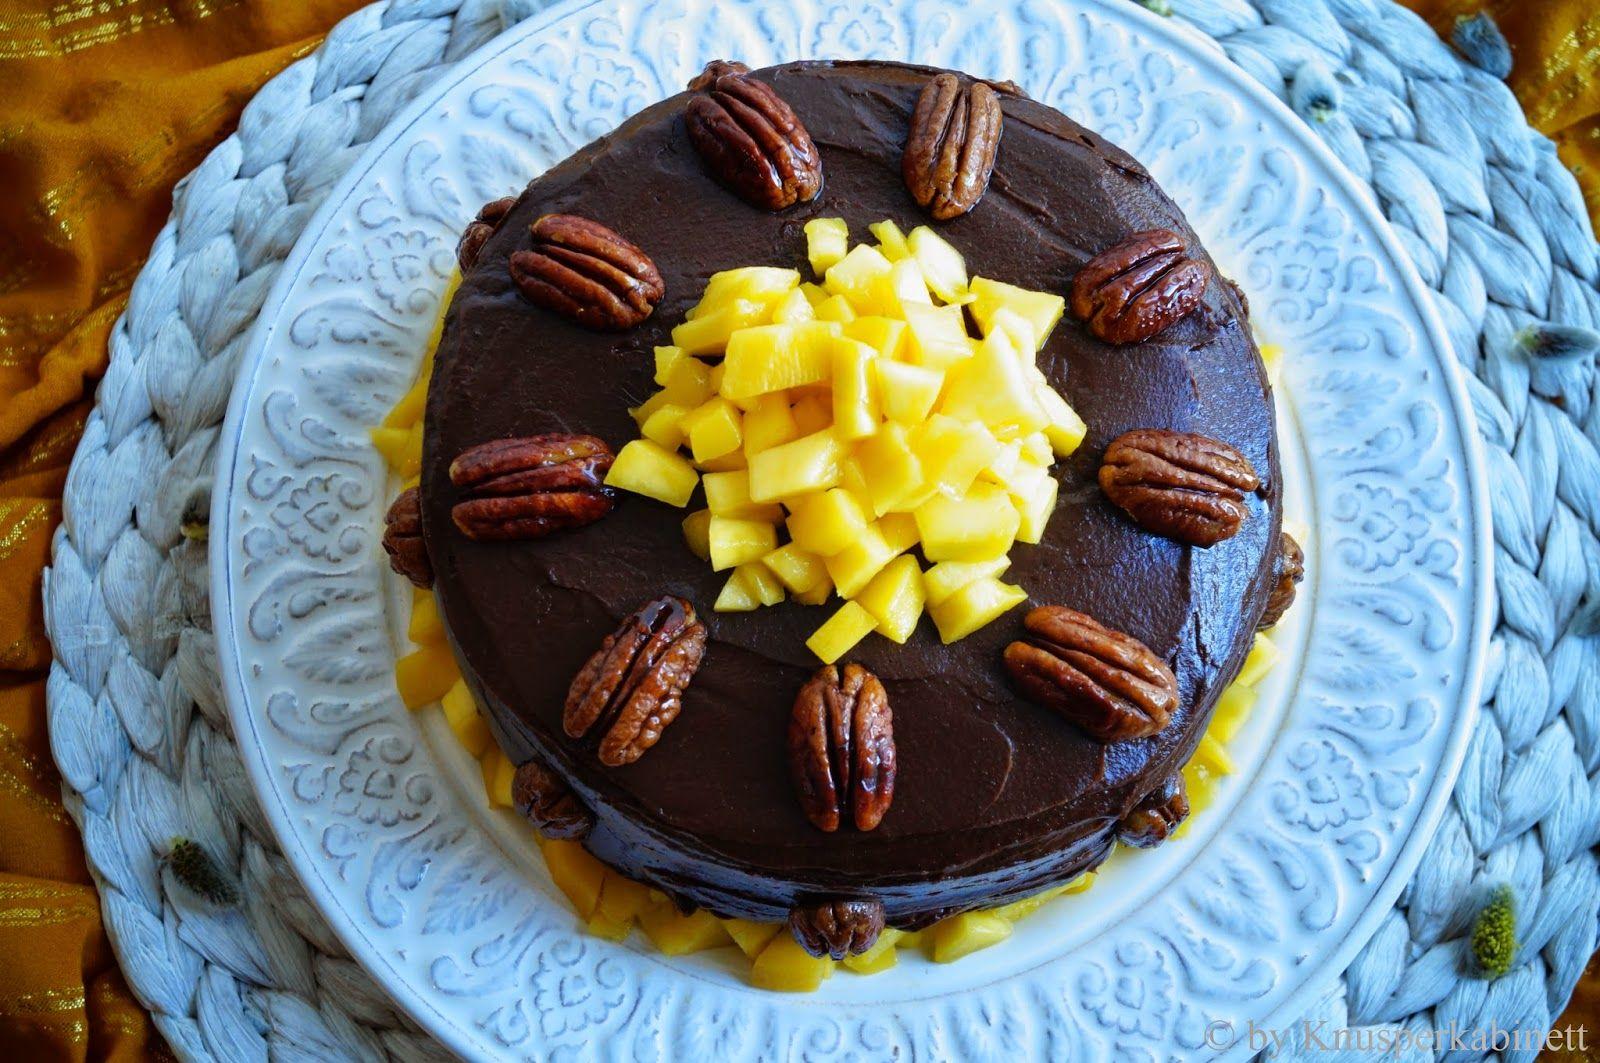 KNUSPERKABINETT: Superfood Schokoladen-Pekannuss-Torte mit Mango-Cashew-Crème